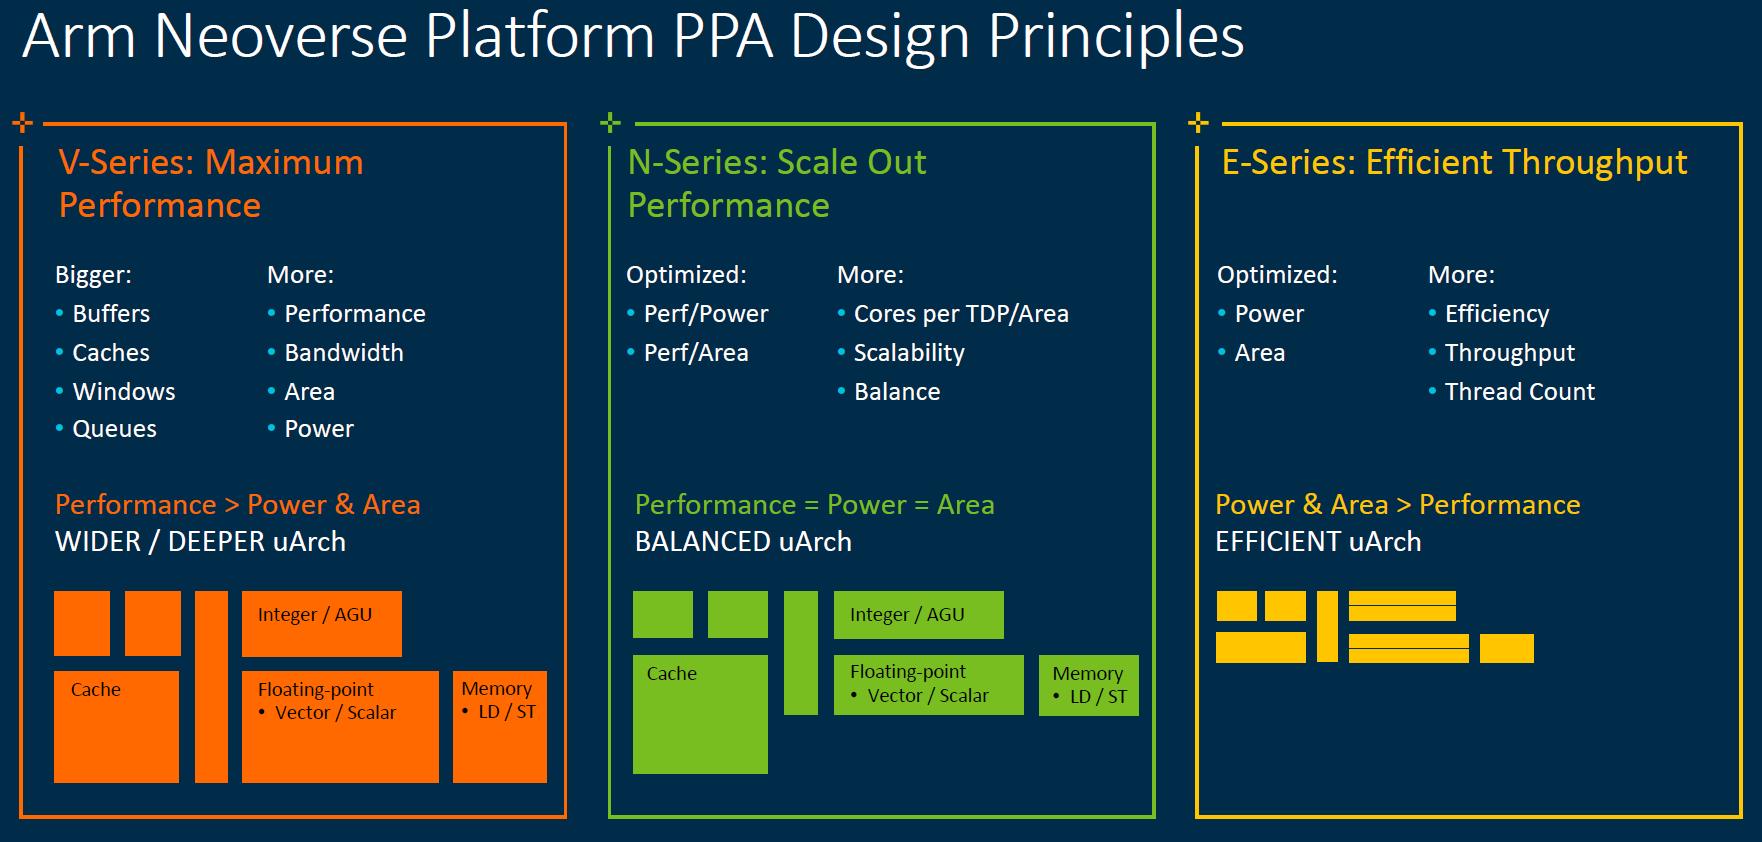 Arm Neoverse 2020 PPA Principles